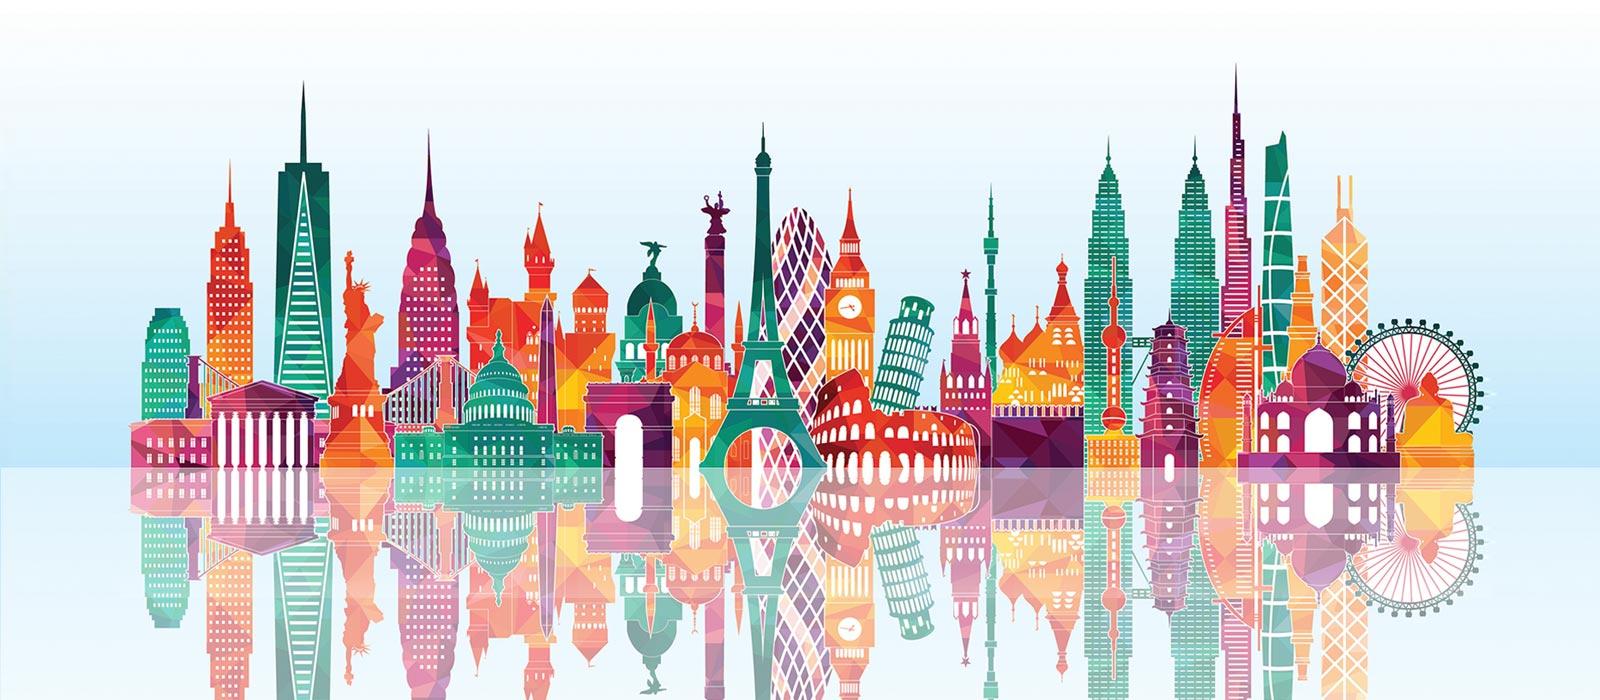 Illustration of world landmarks as one colorful big city